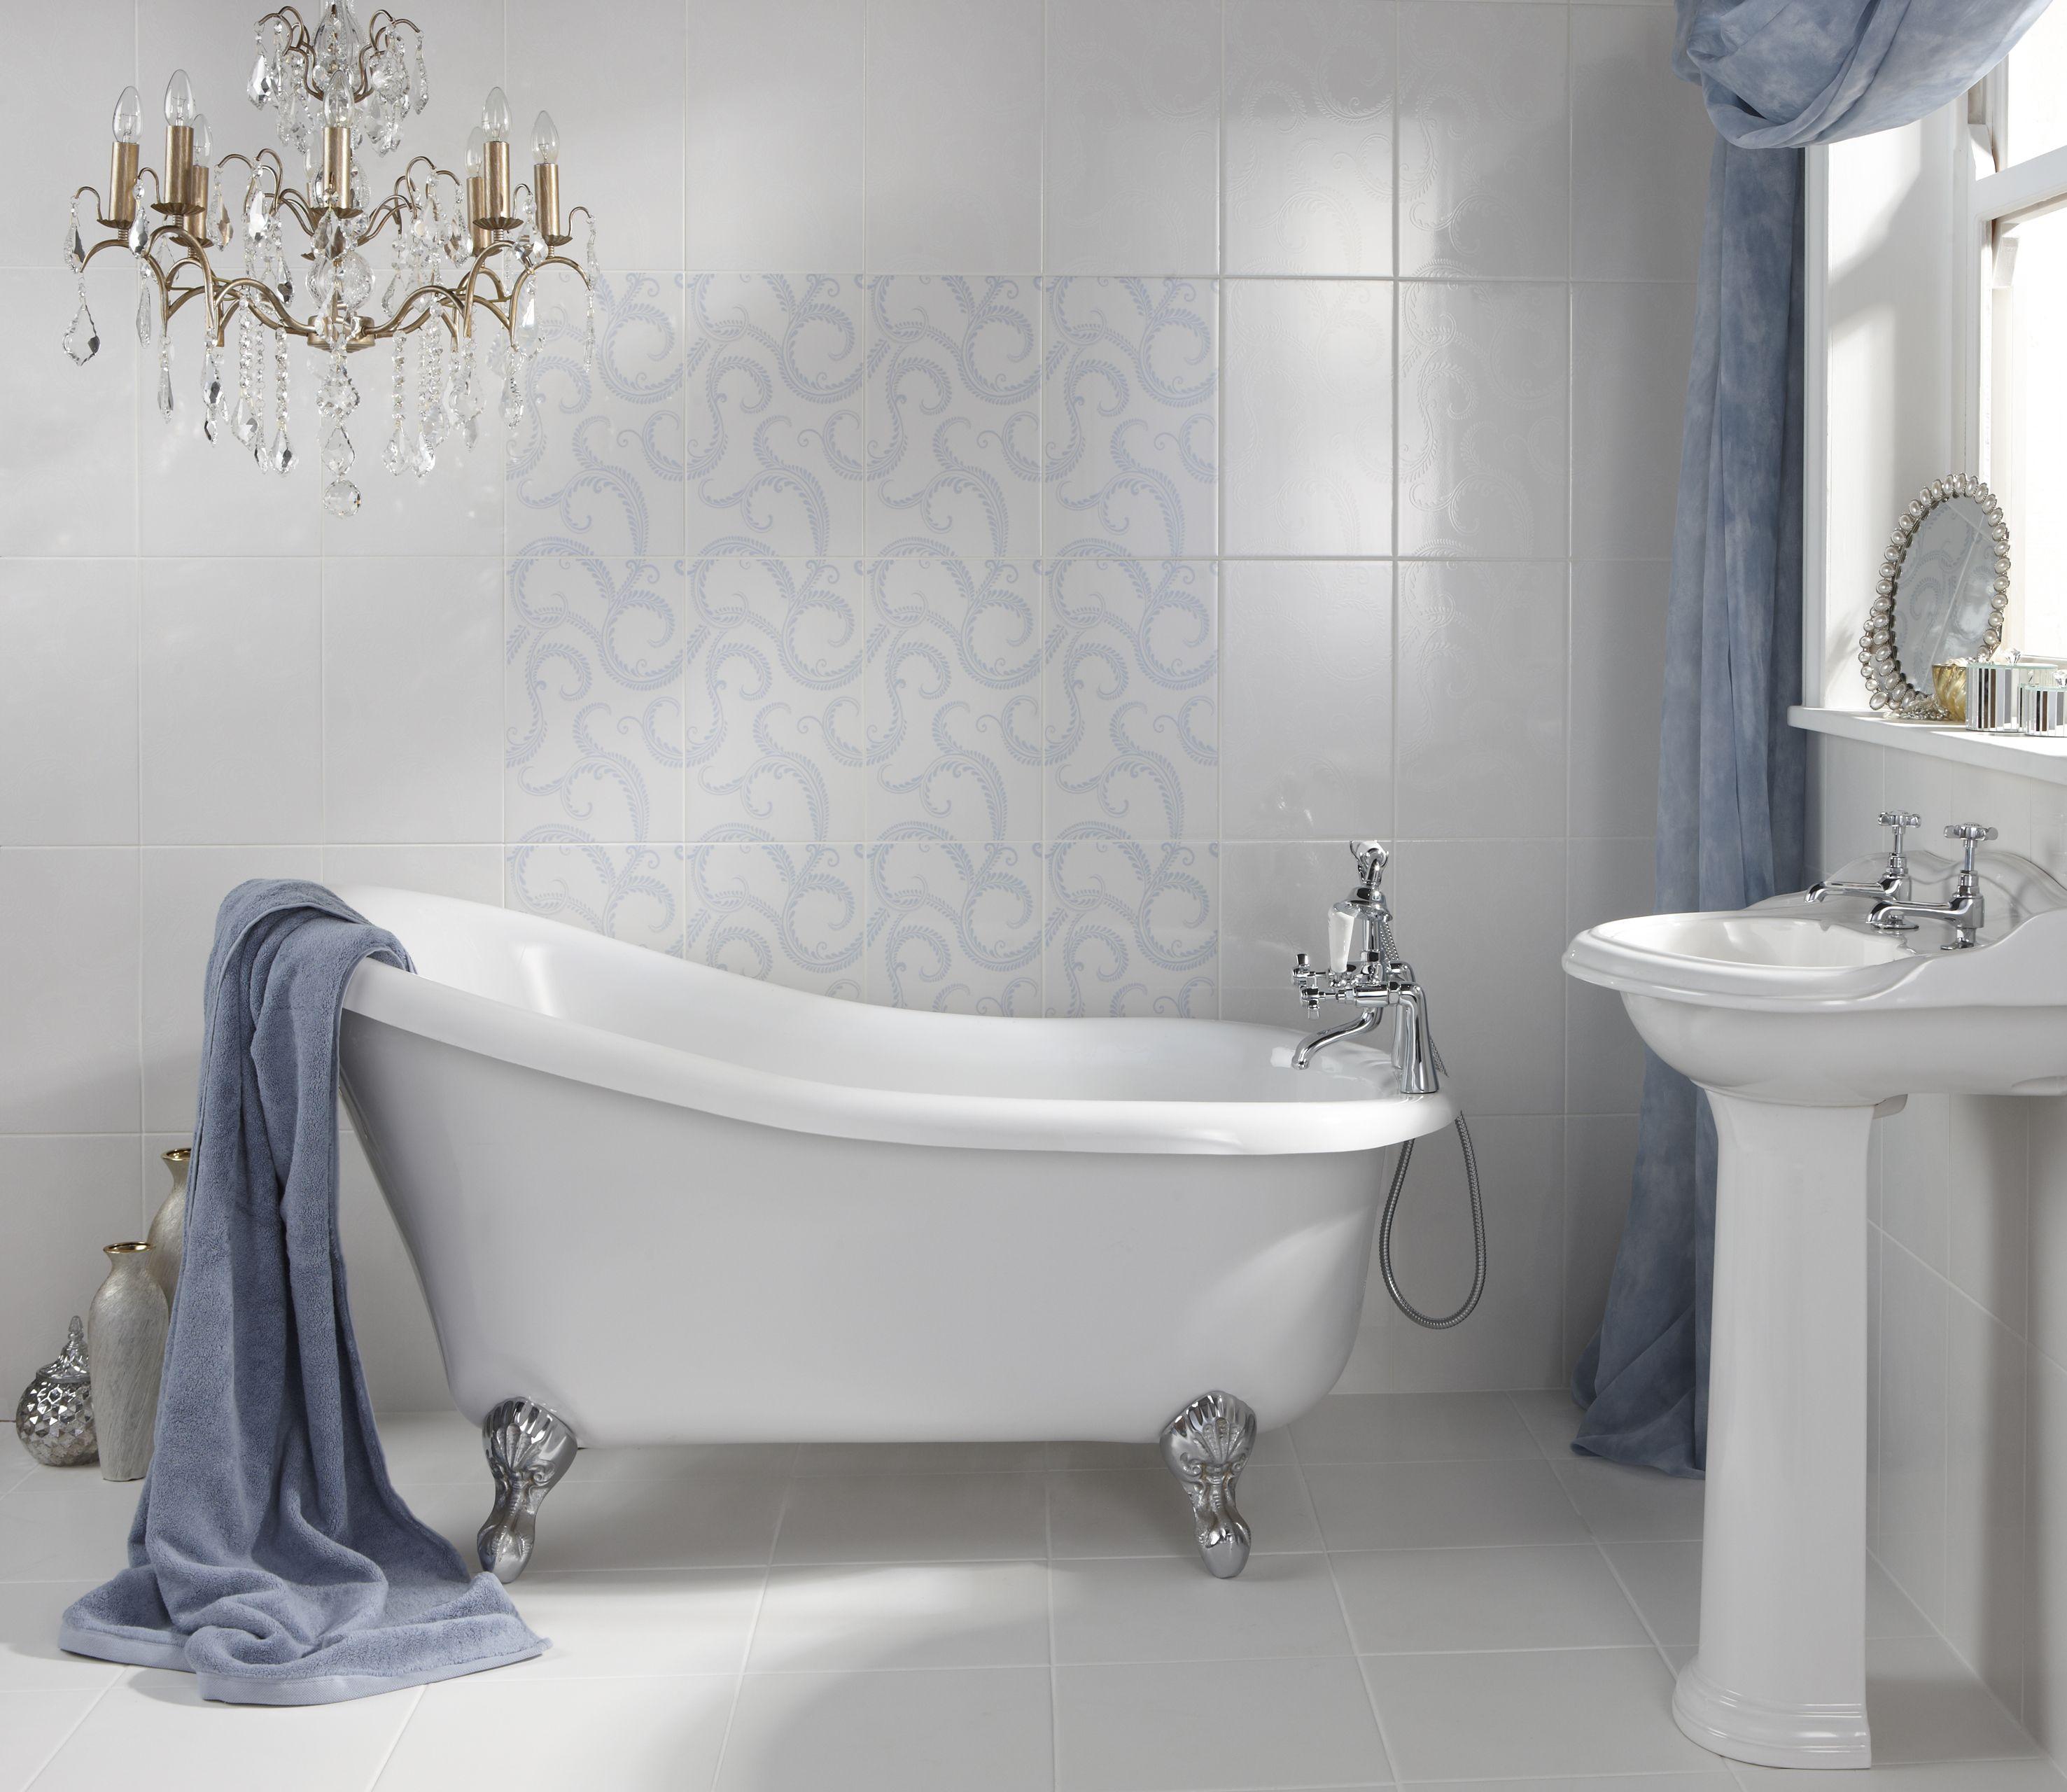 Laura Ashley Bathroom Tiles 2953x2560 Download Hd Wallpaper Wallpapertip,Corner Kitchen Cabinet Storage